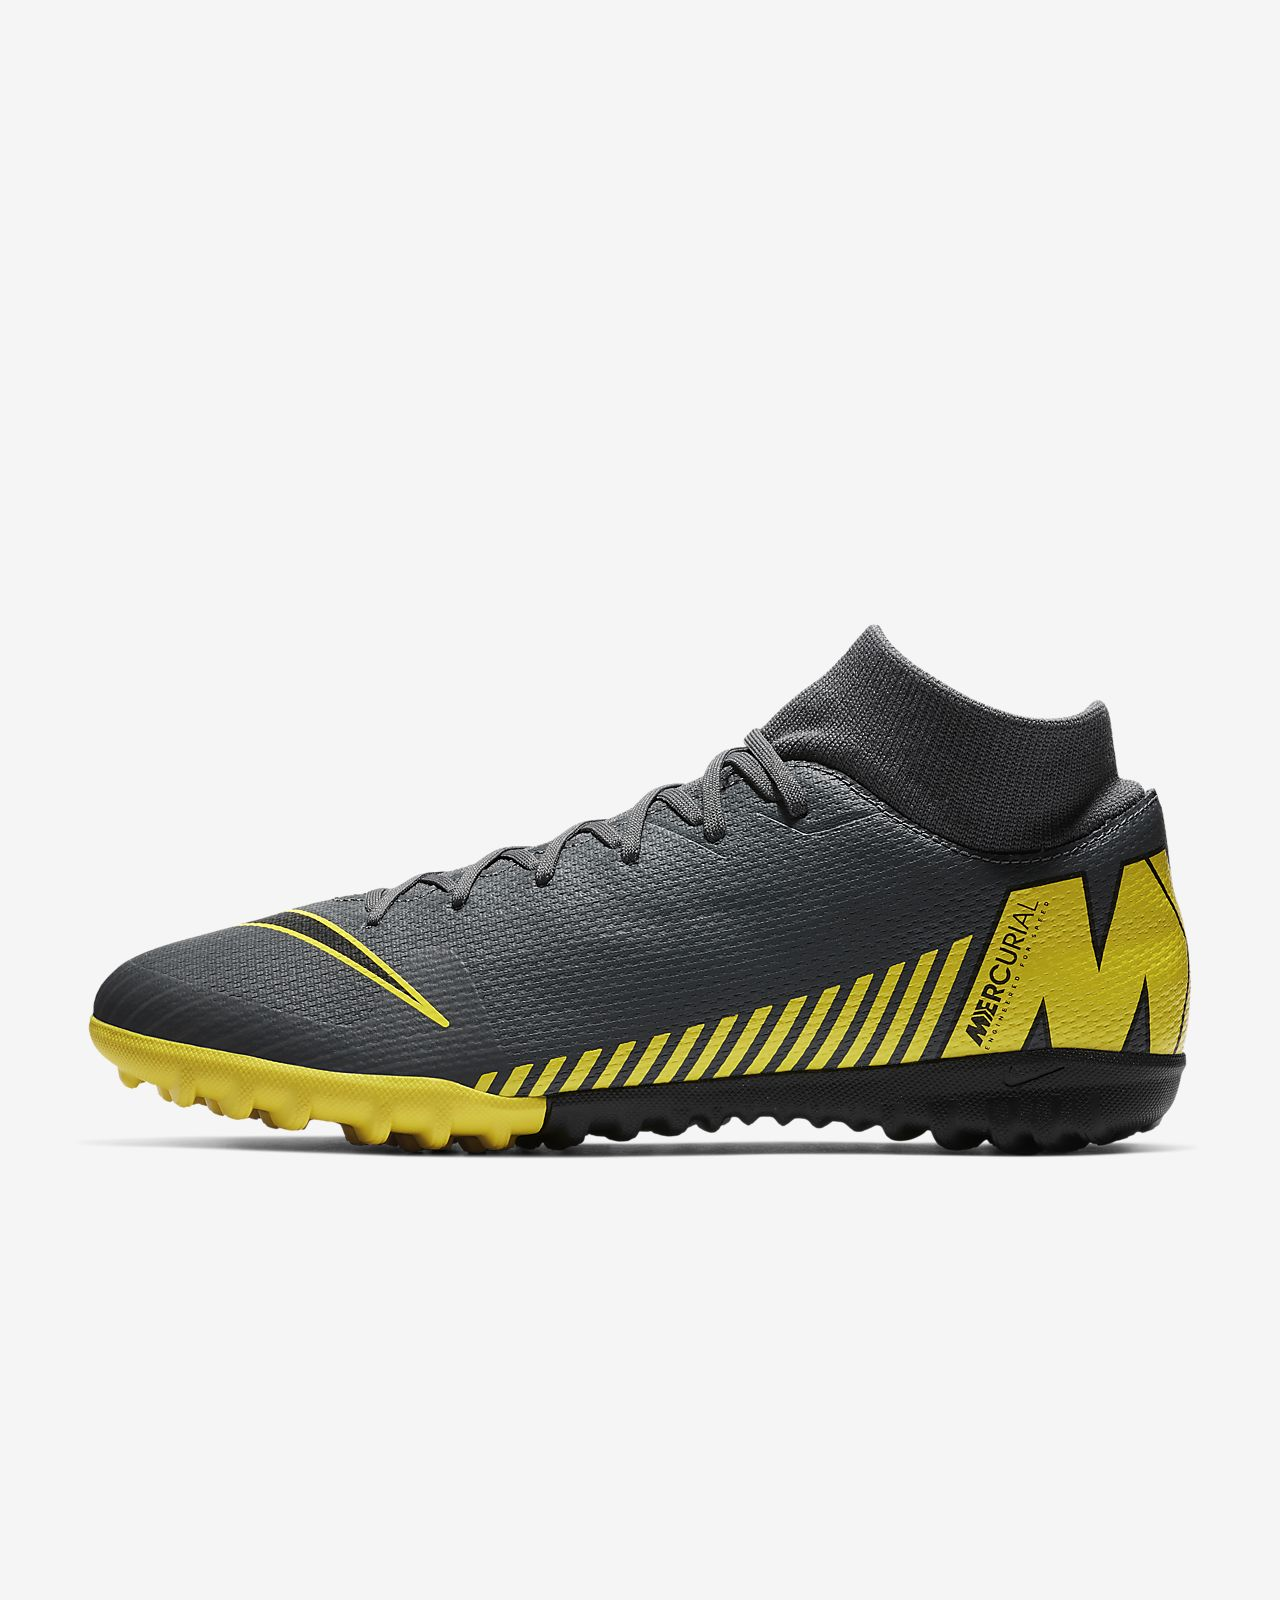 Nike SuperflyX 6 Academy TF-fodboldstøvle til grus